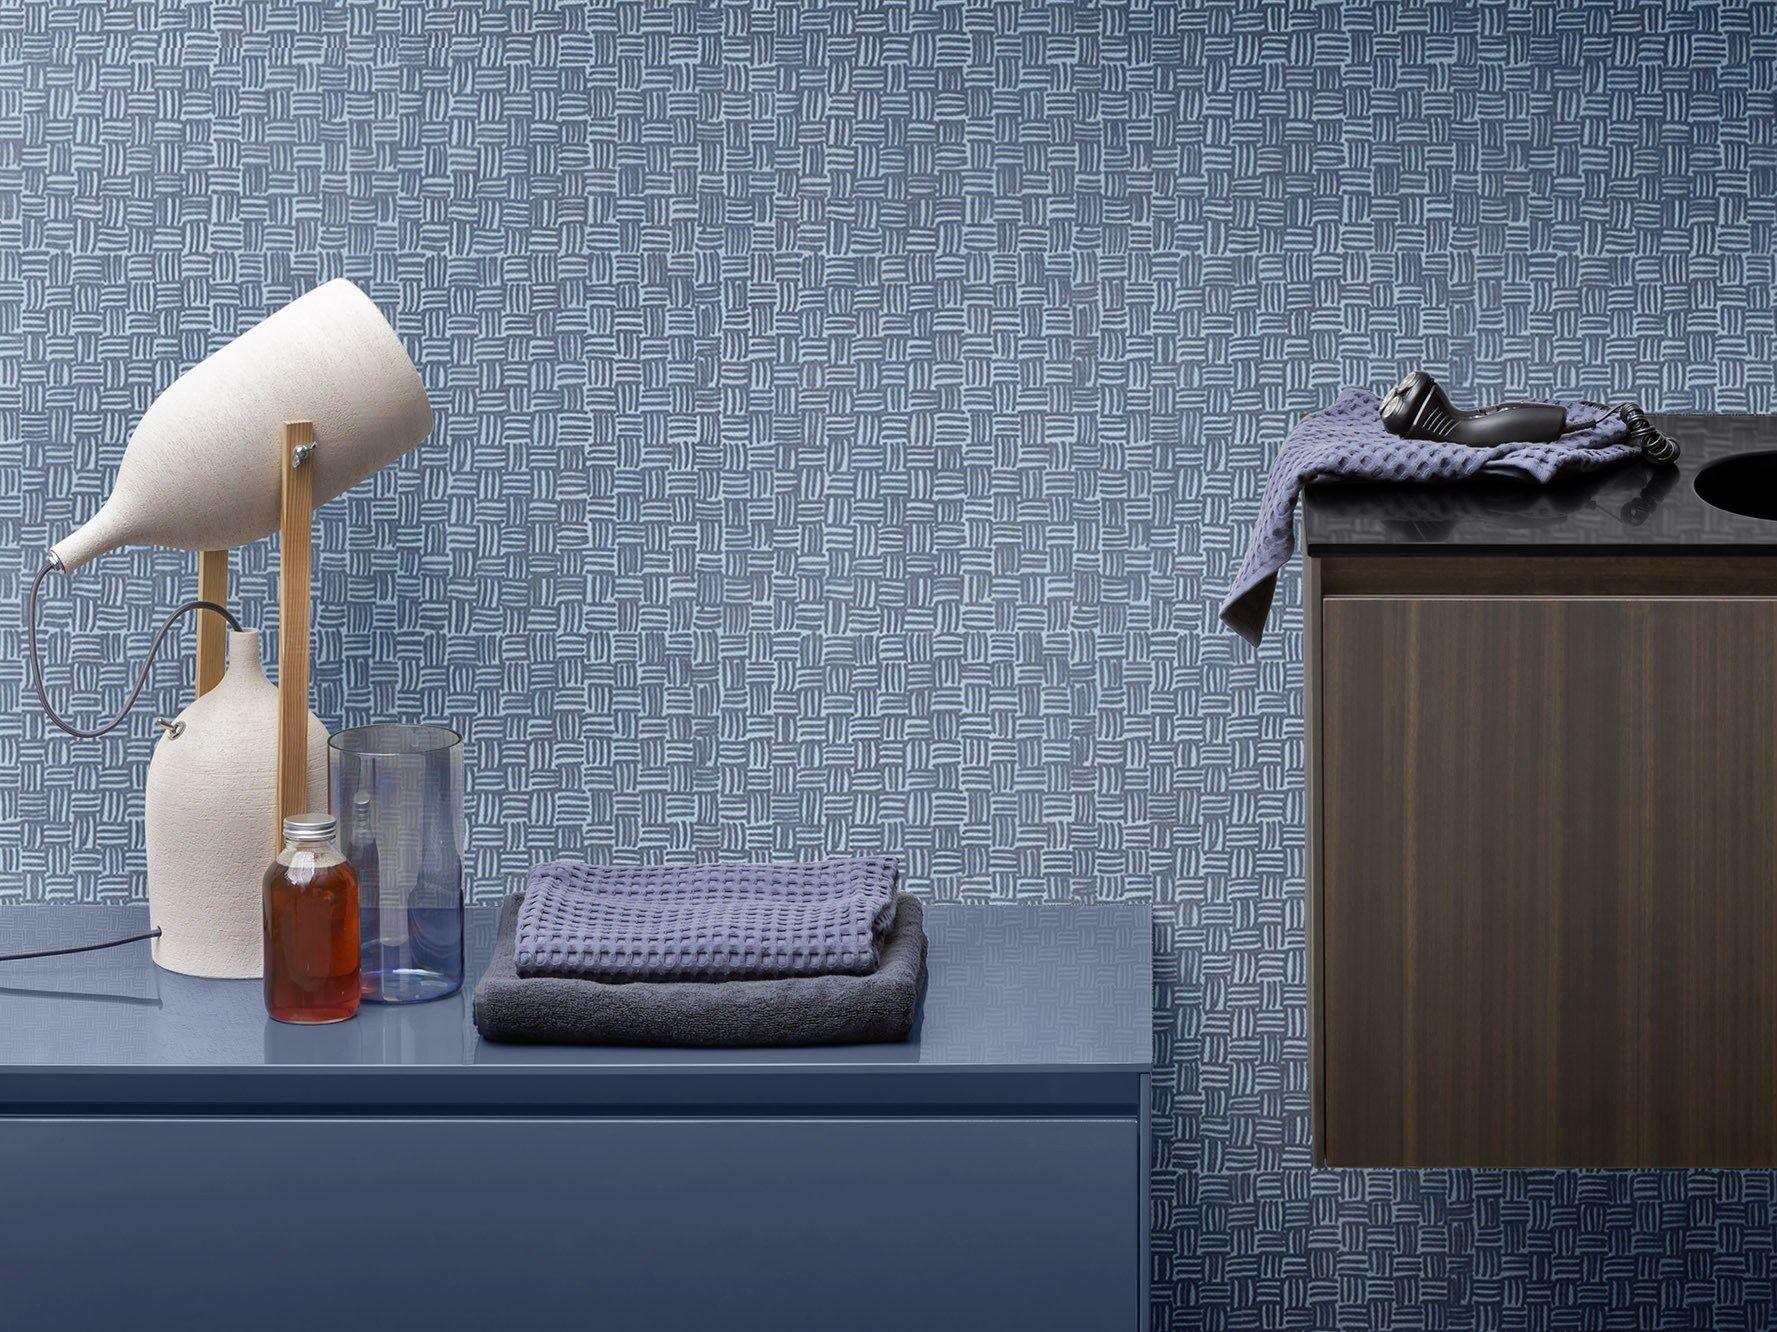 wasserfeste platten f r badezimmer ostseesuche com. Black Bedroom Furniture Sets. Home Design Ideas